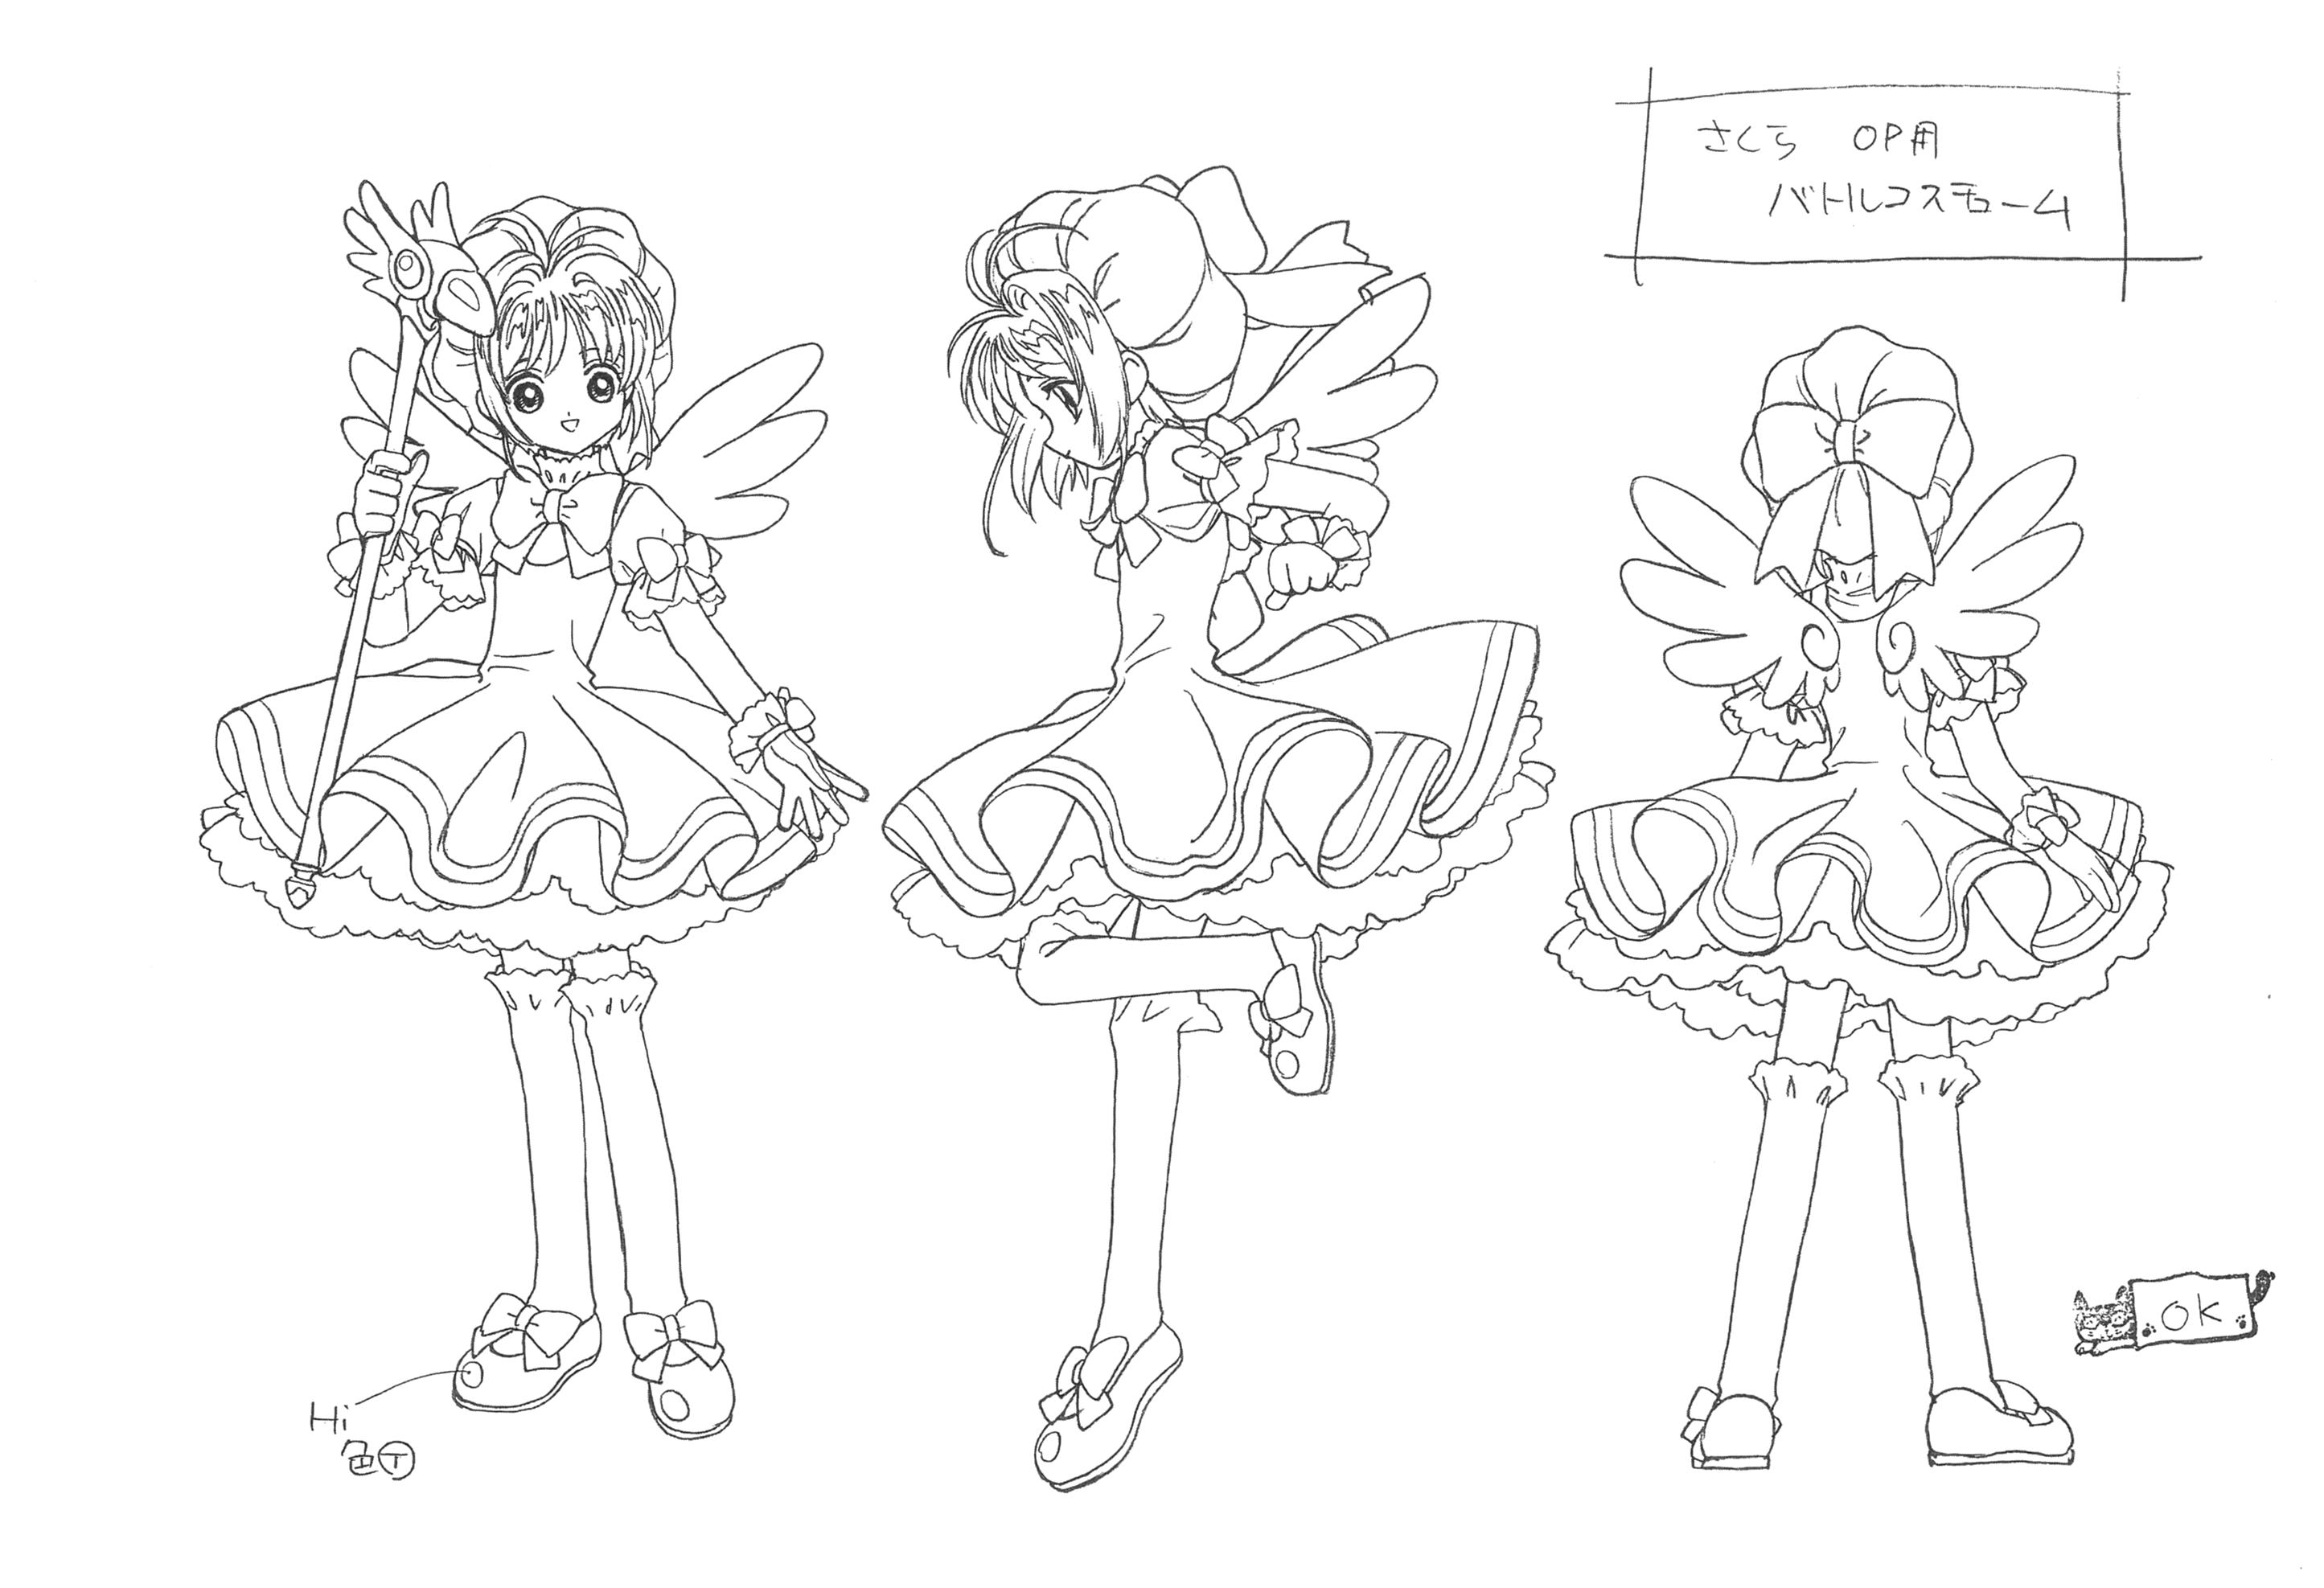 Cardcaptor Sakura Animated Works (Special Edition)